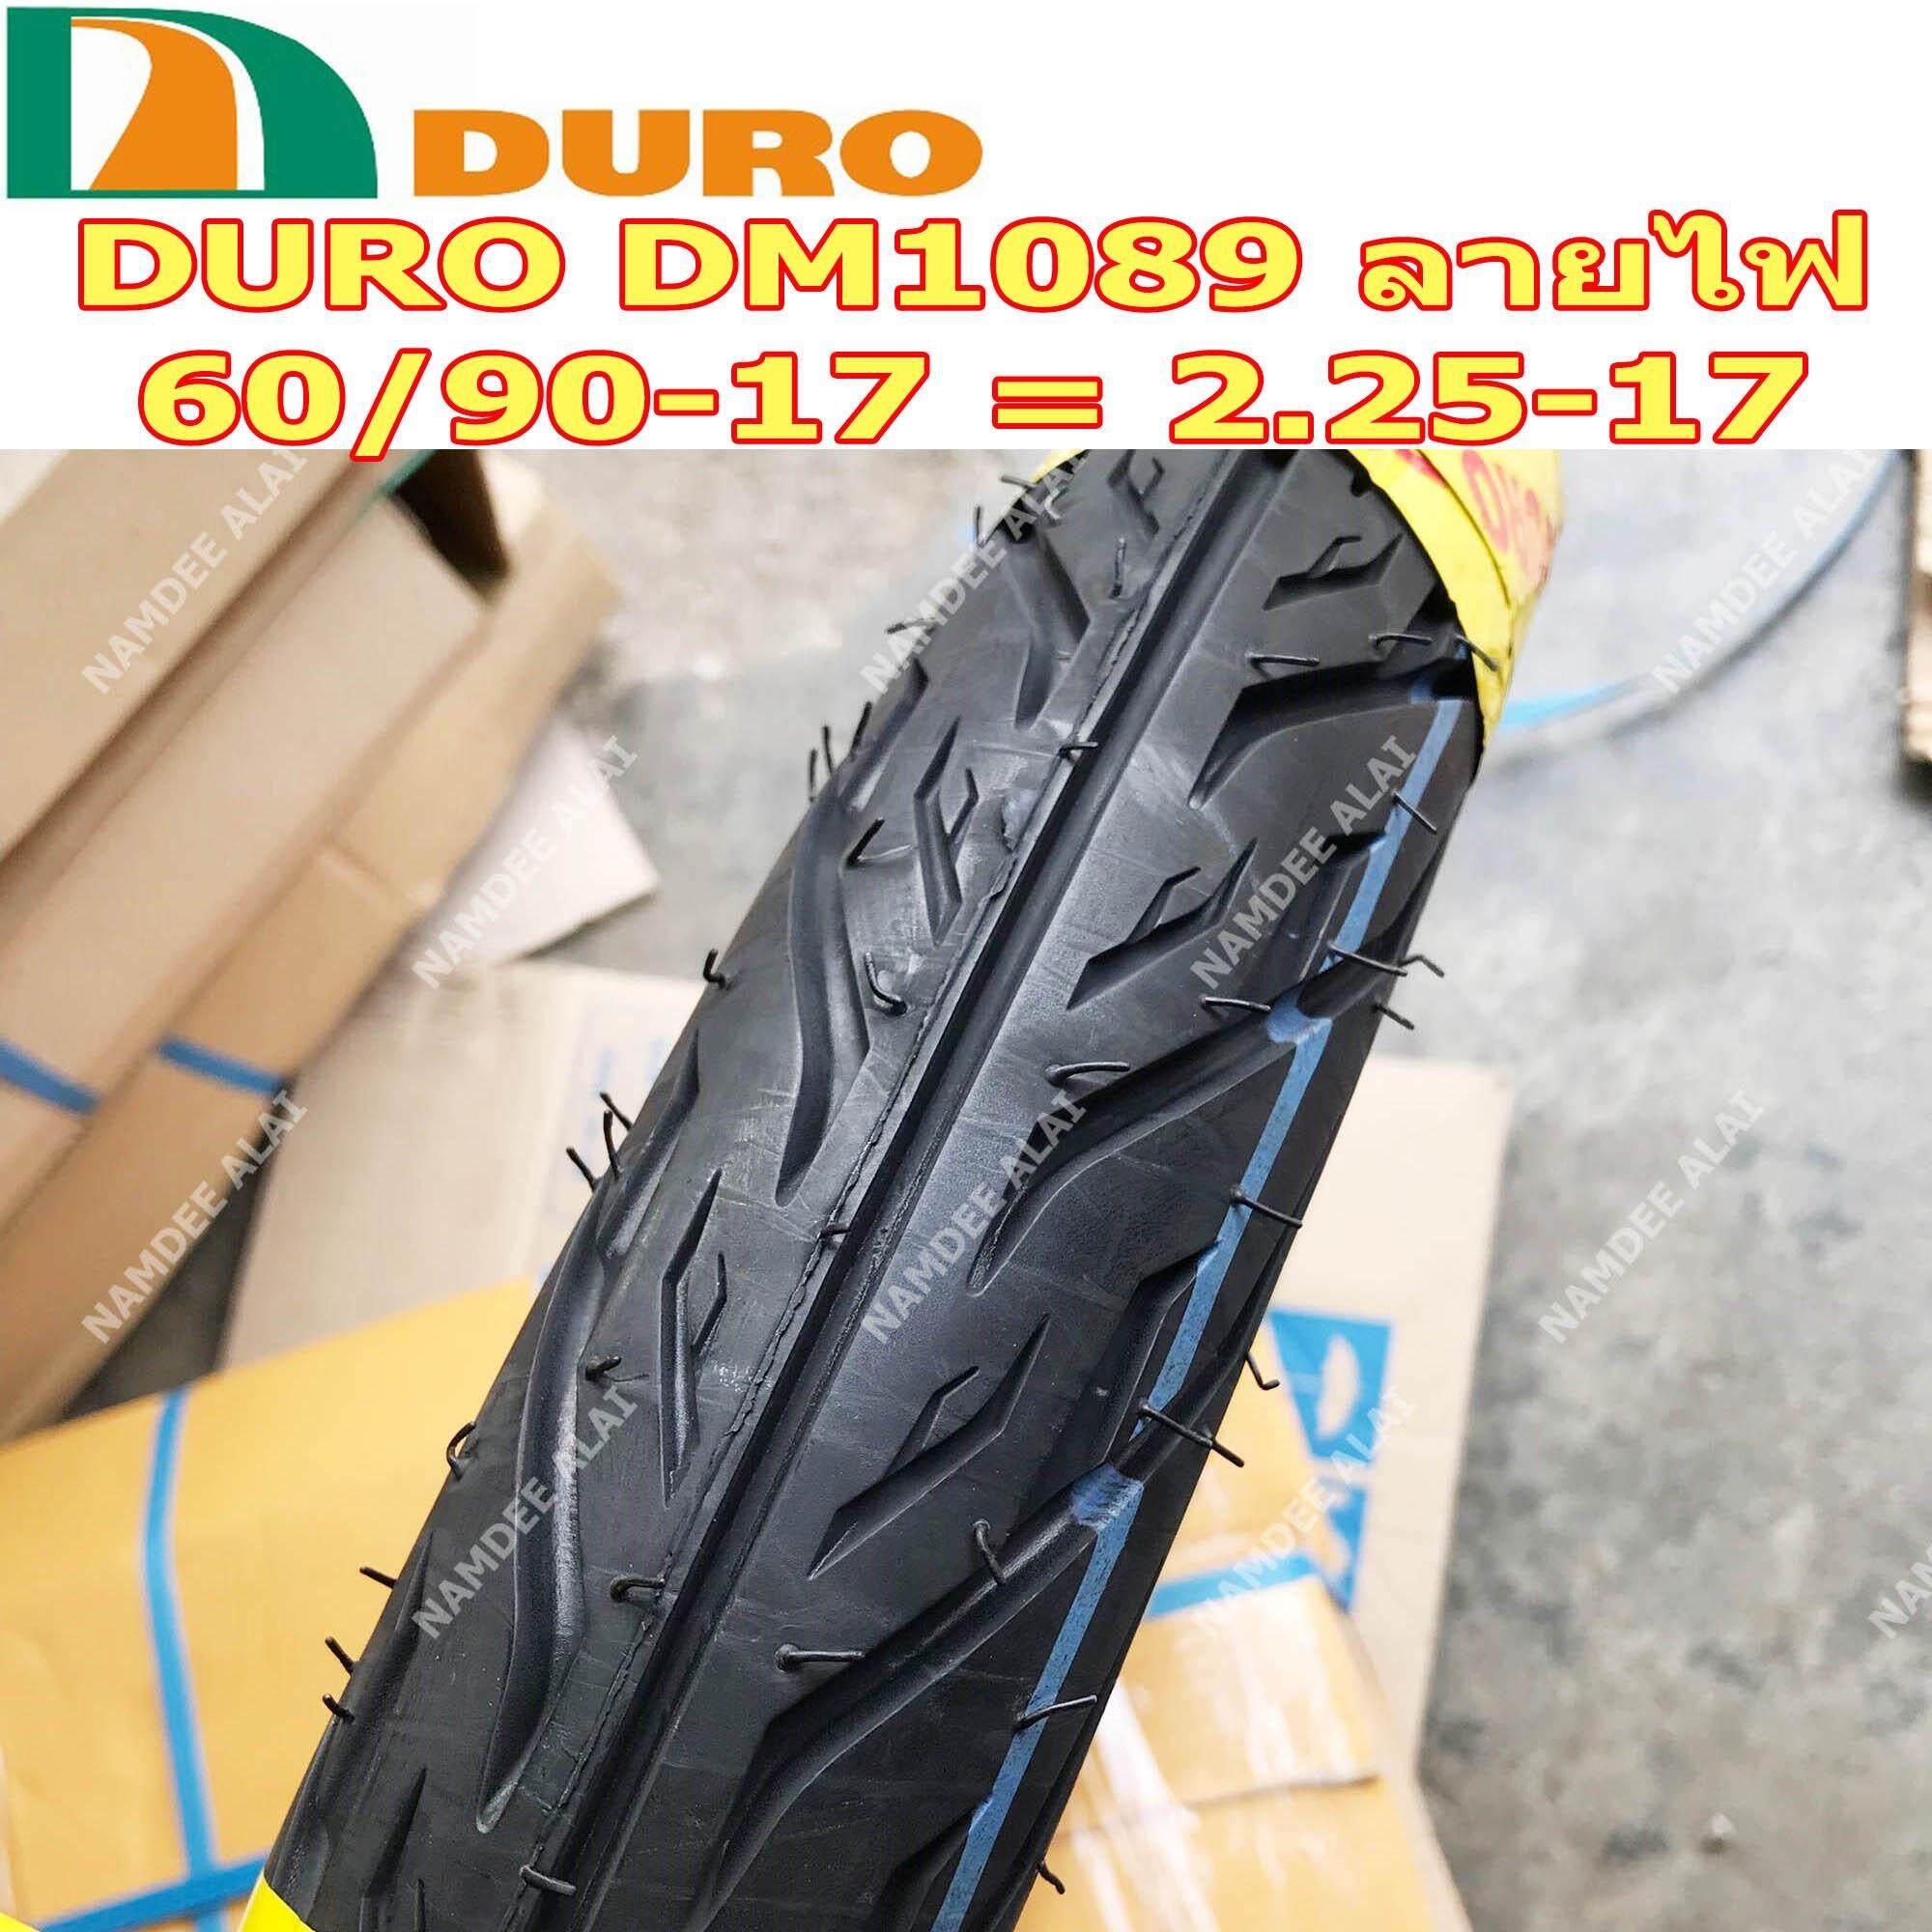 Duro ดูโร่ ยางนอก รุ่น Dm1089 60/90-17 = 2.25-17 ลายไฟ หรือ ลายอีเกิ้ล (eagle) 1 เส้น By Namdee Alai.